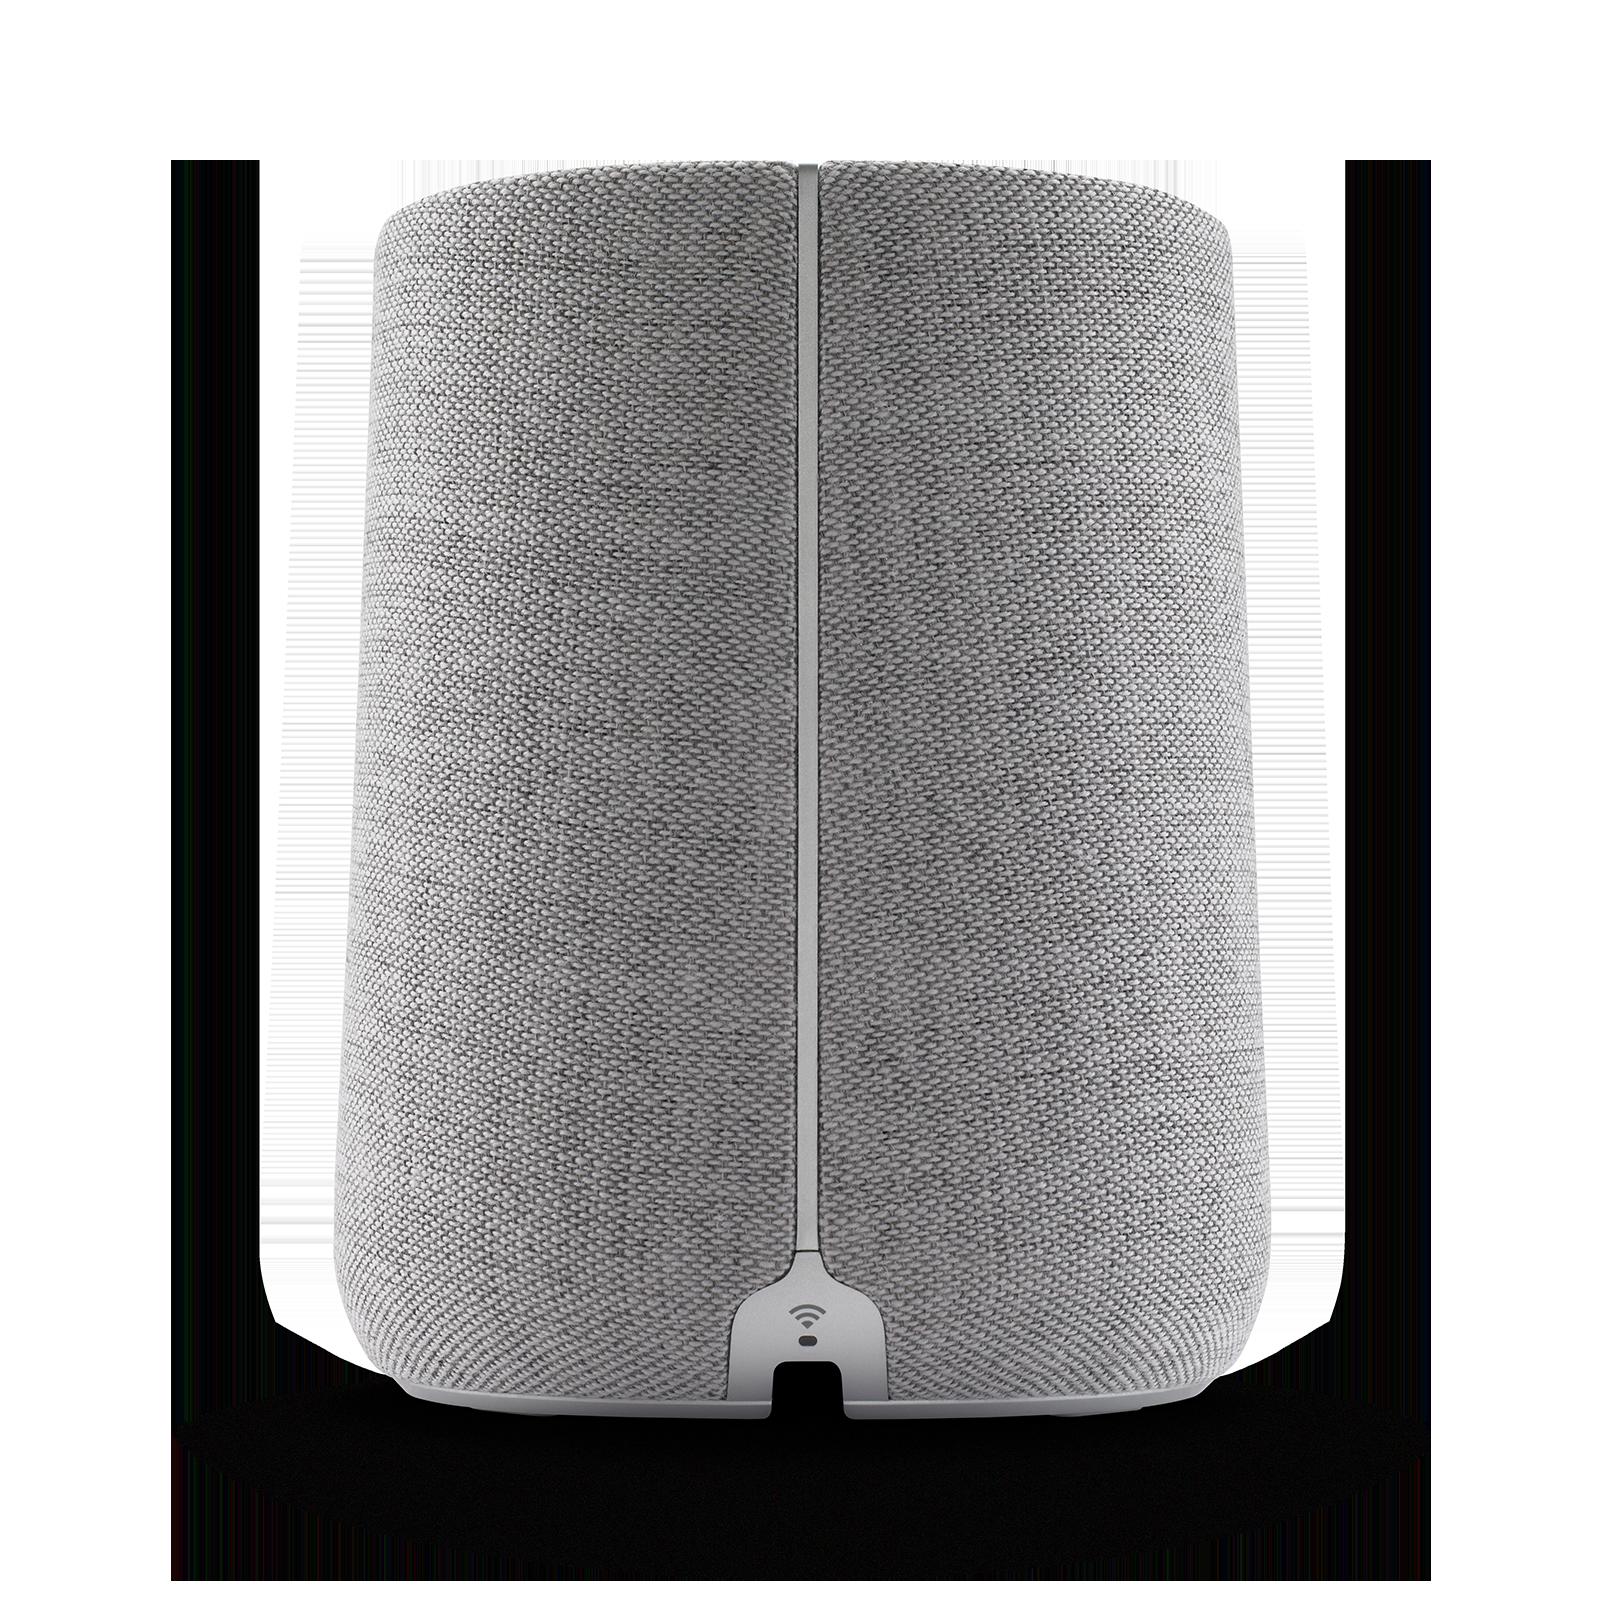 Harman Kardon Citation One MKII - Grey - All-in-one smart speaker with room-filling sound - Back